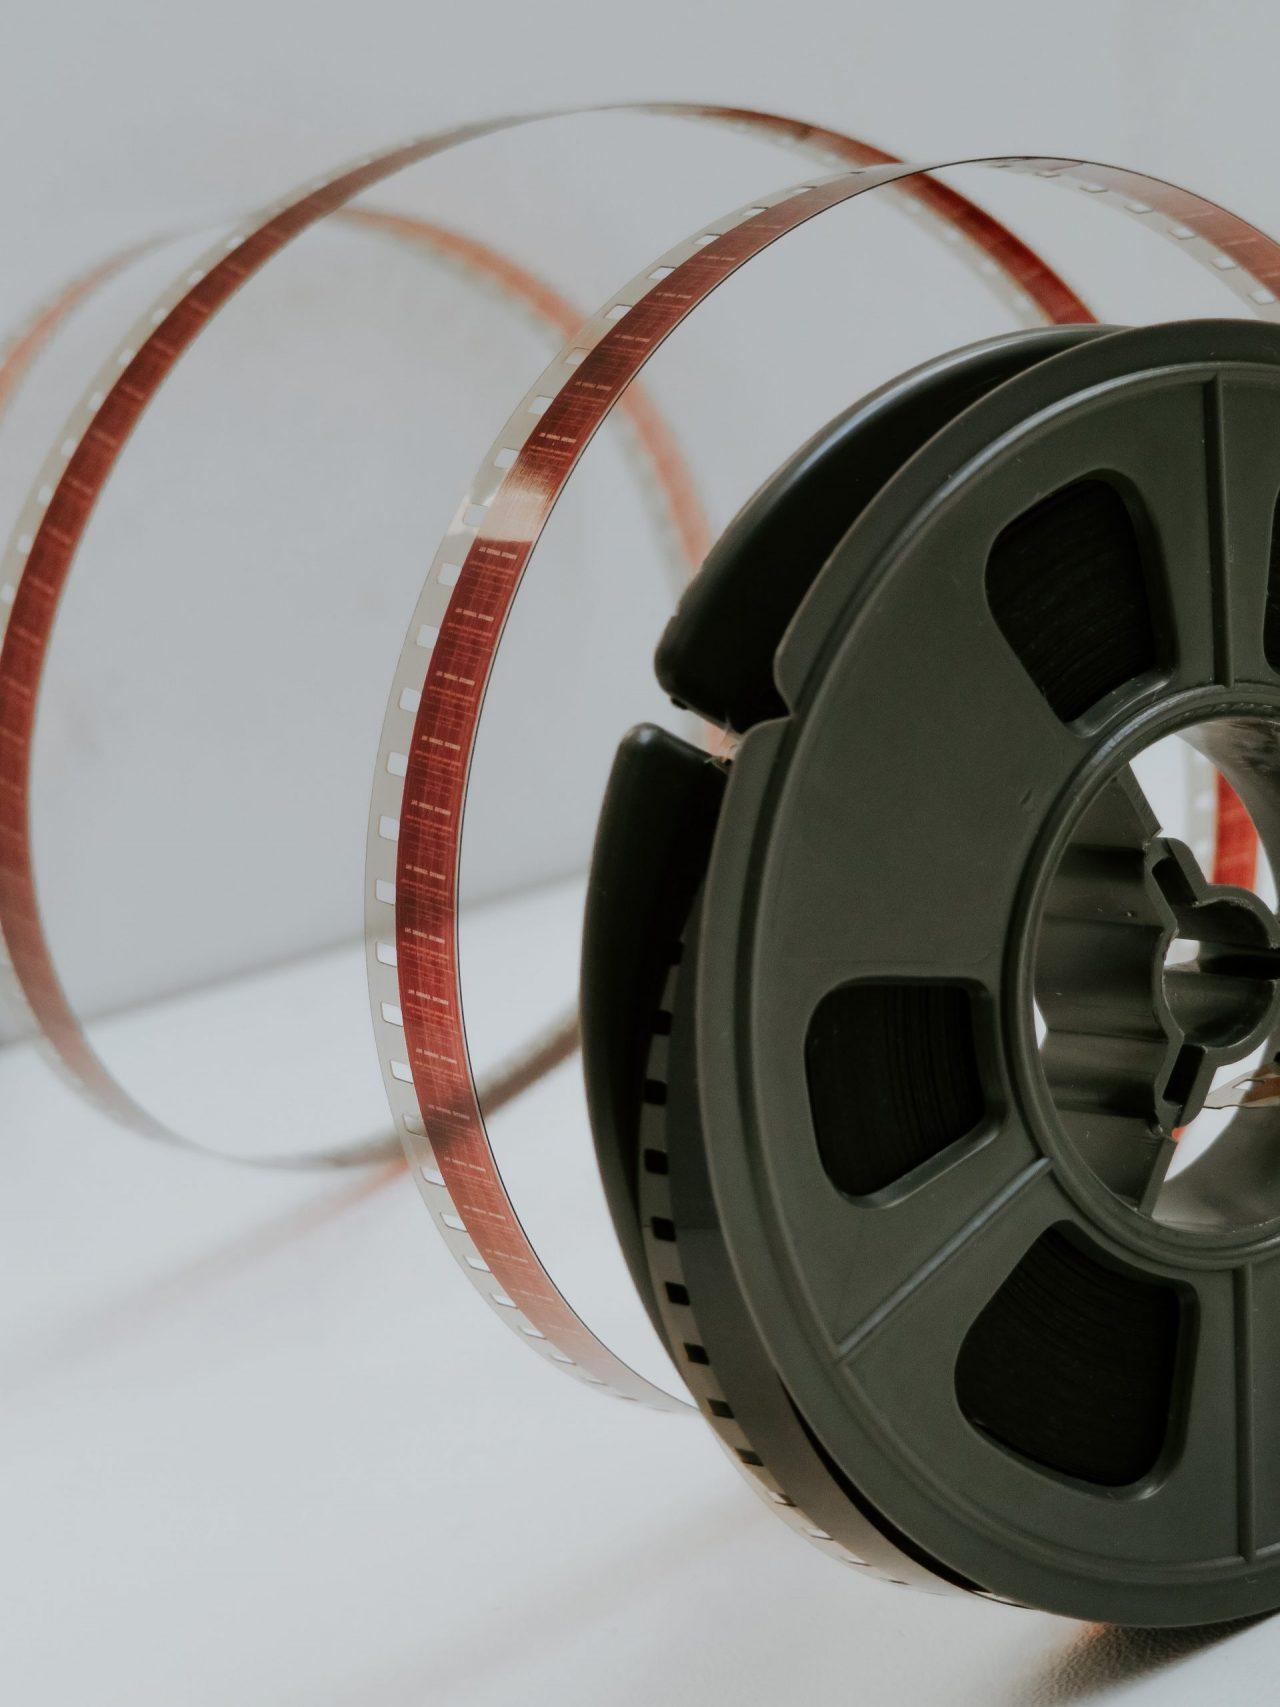 8mm film roll